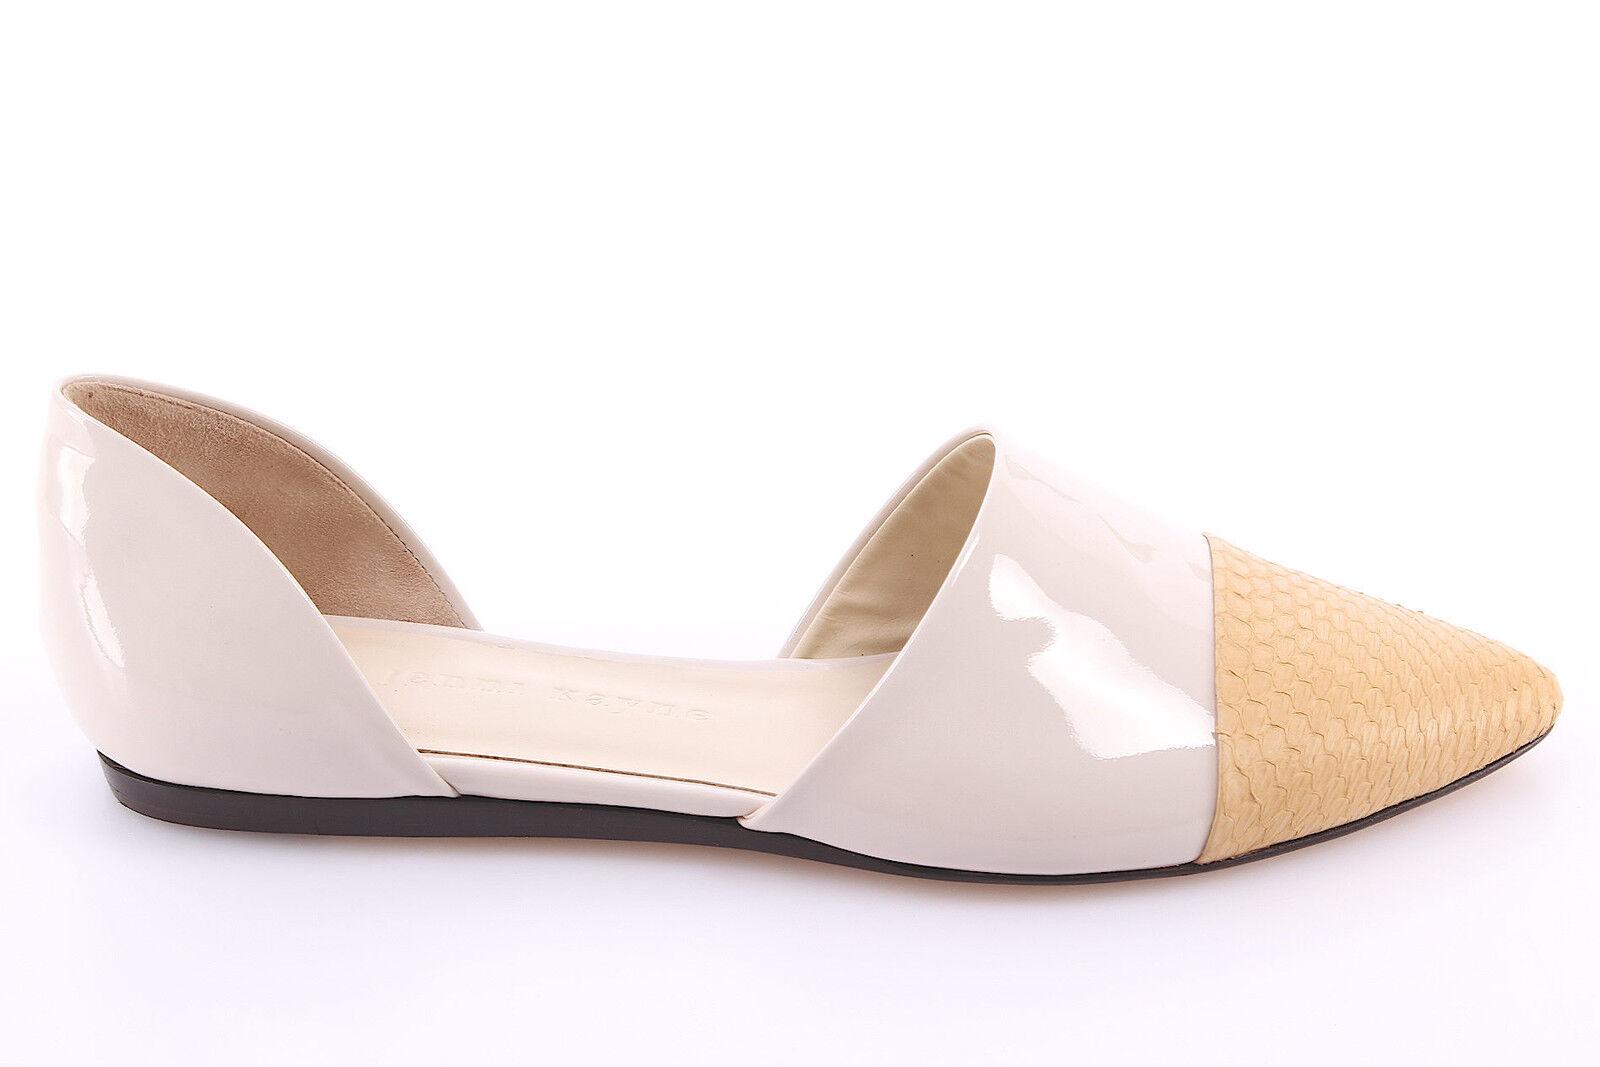 Damen Schuhe Ballerinas Sandalen JENNI KAYNE Leder Glossy Weiß Real Snake Neue